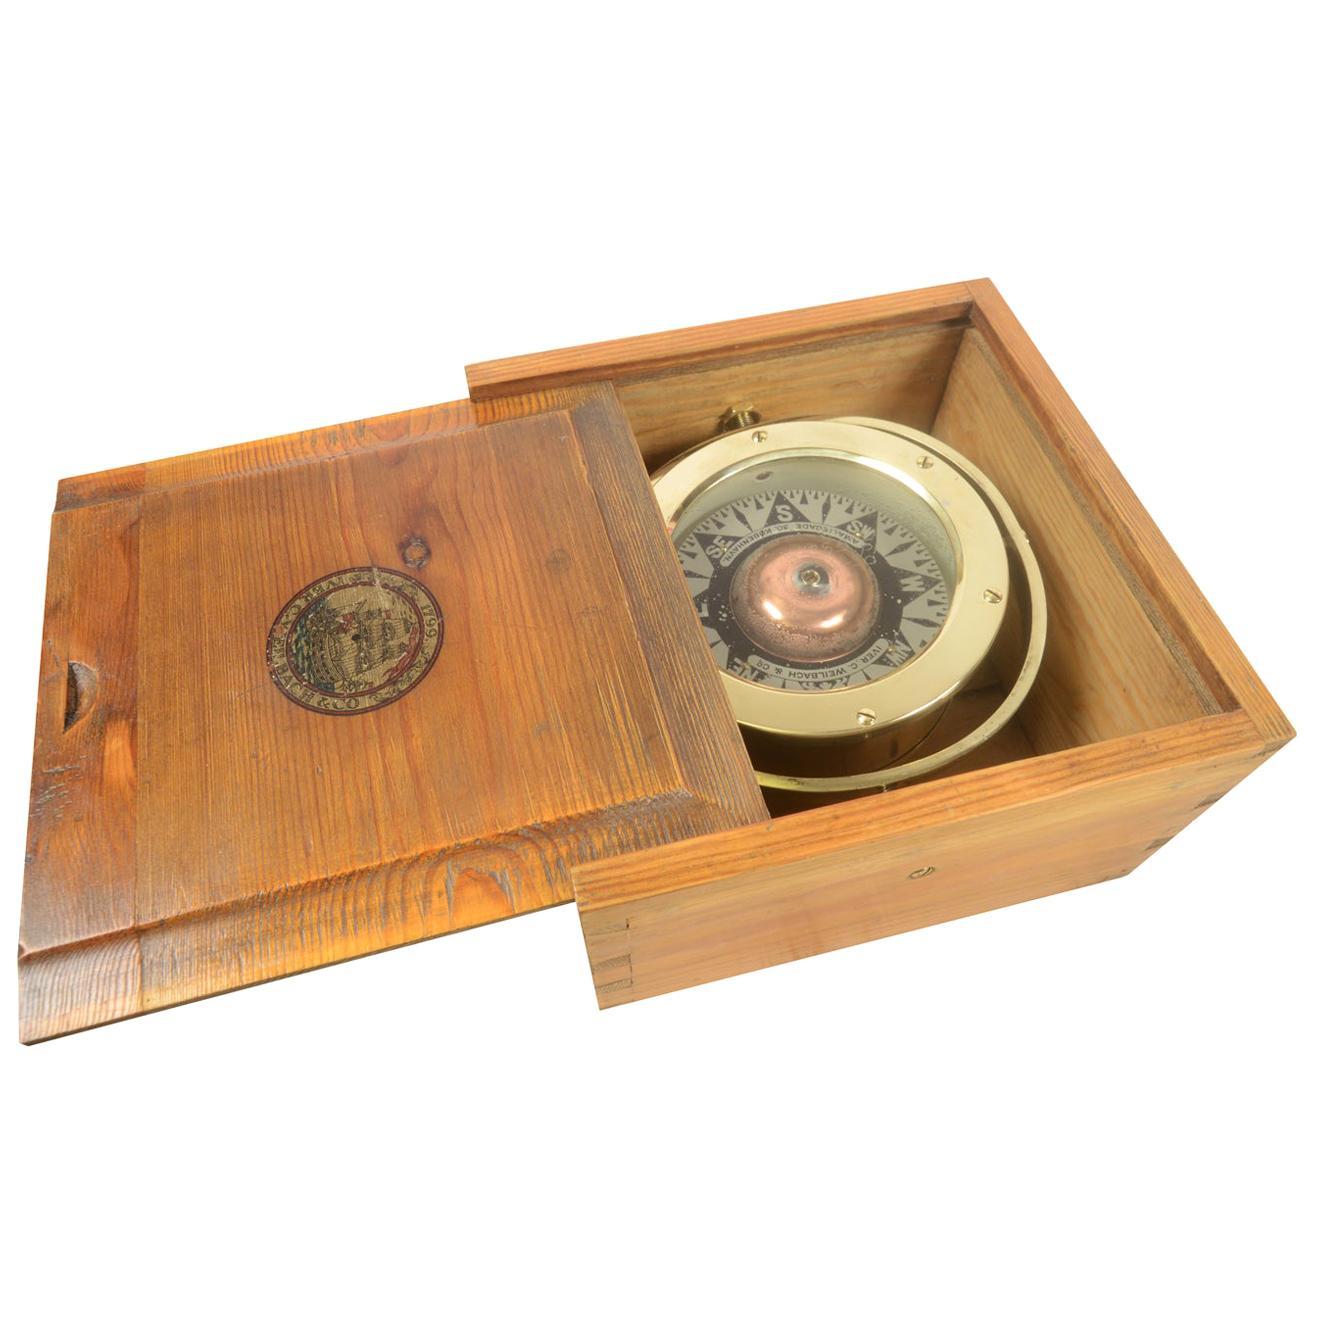 Danish Brass Compass in its Original Wooden Box, 1920s-1930s